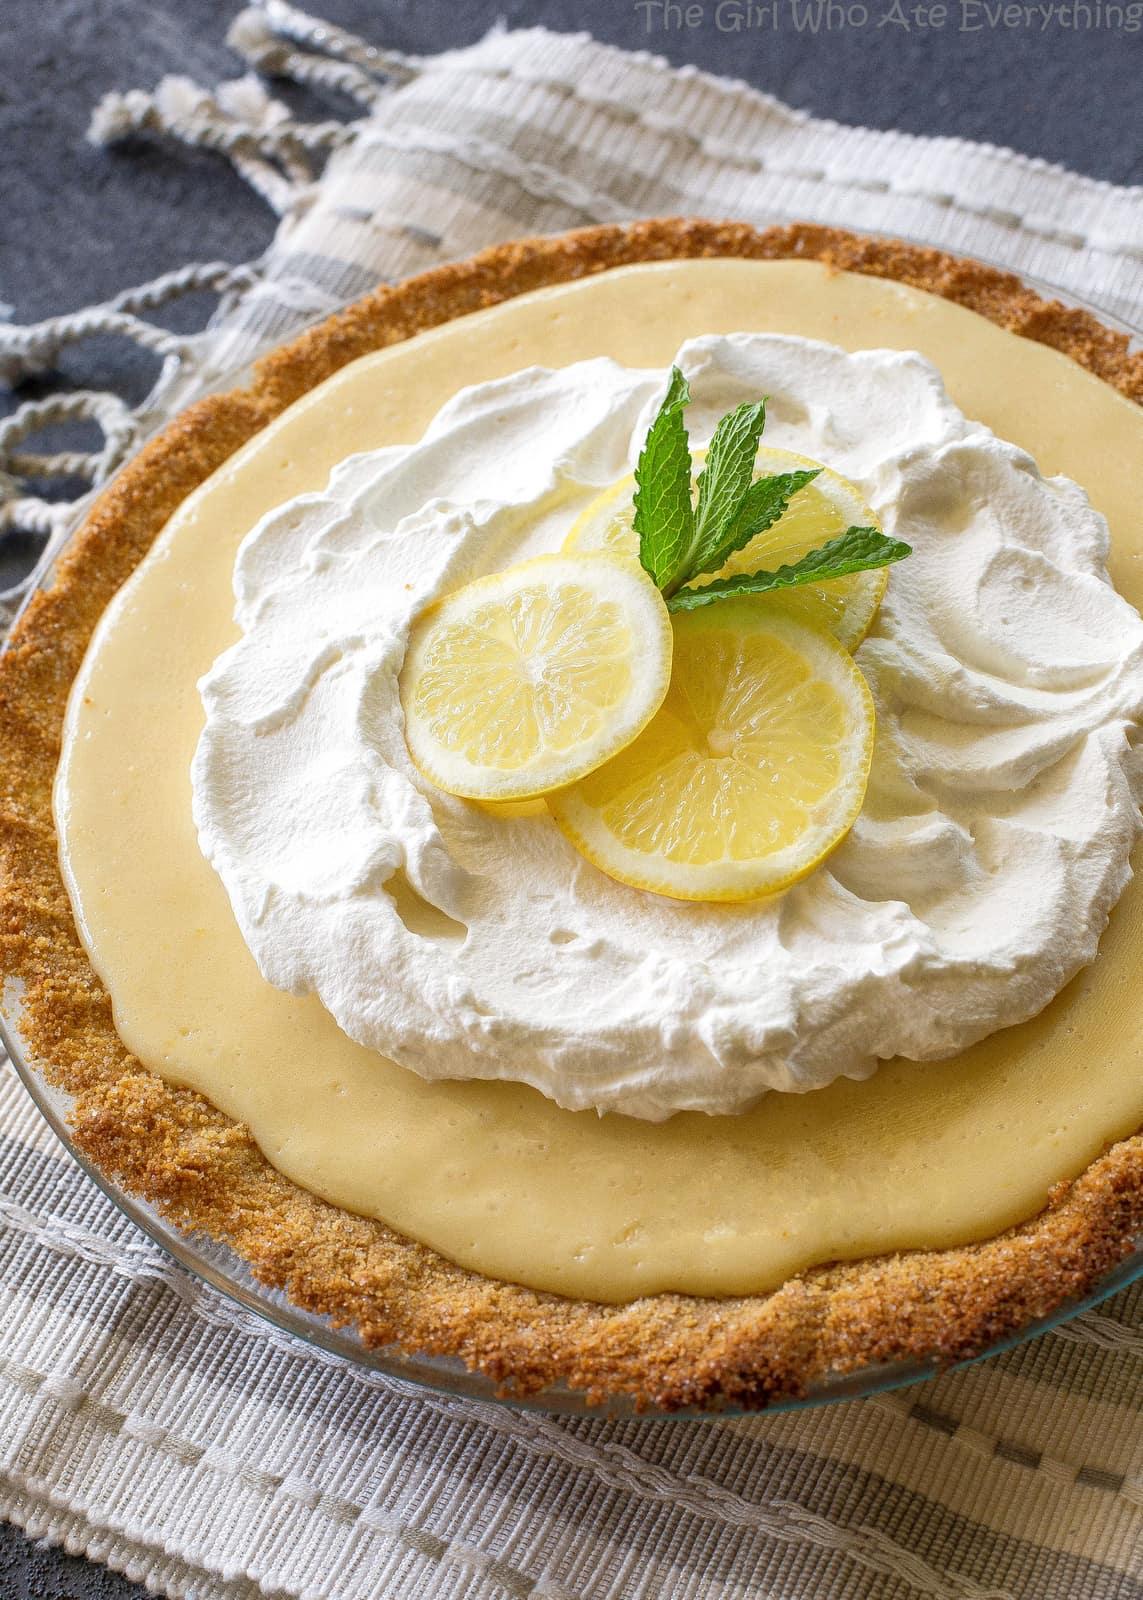 Lemon Pie - The Girl Who Ate Everything